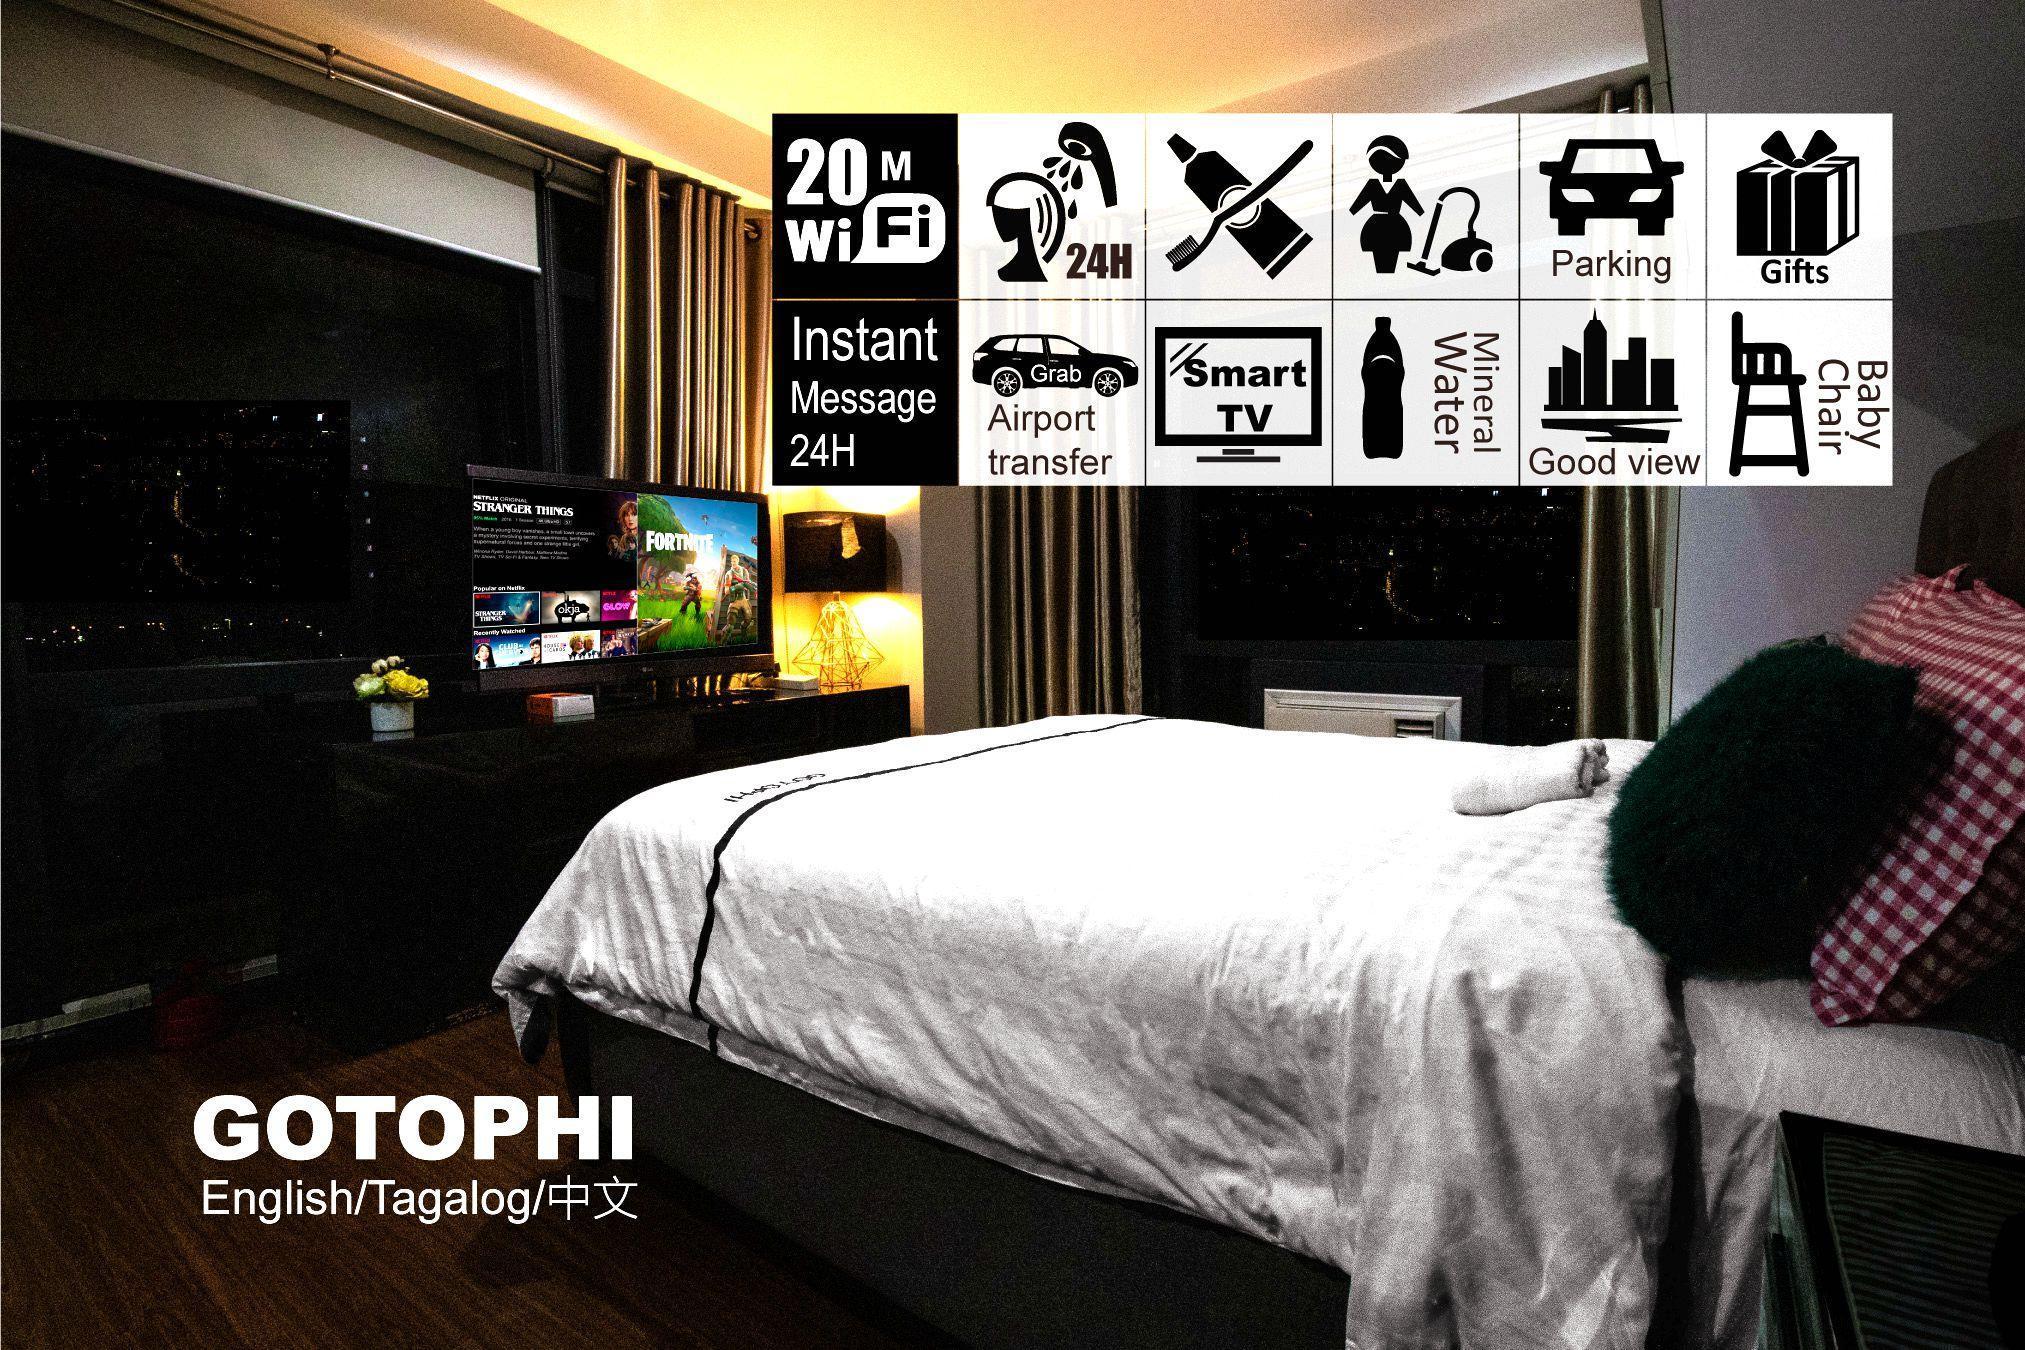 Gotophi Luxurious 5Star hotel Gramercy Makati 4730